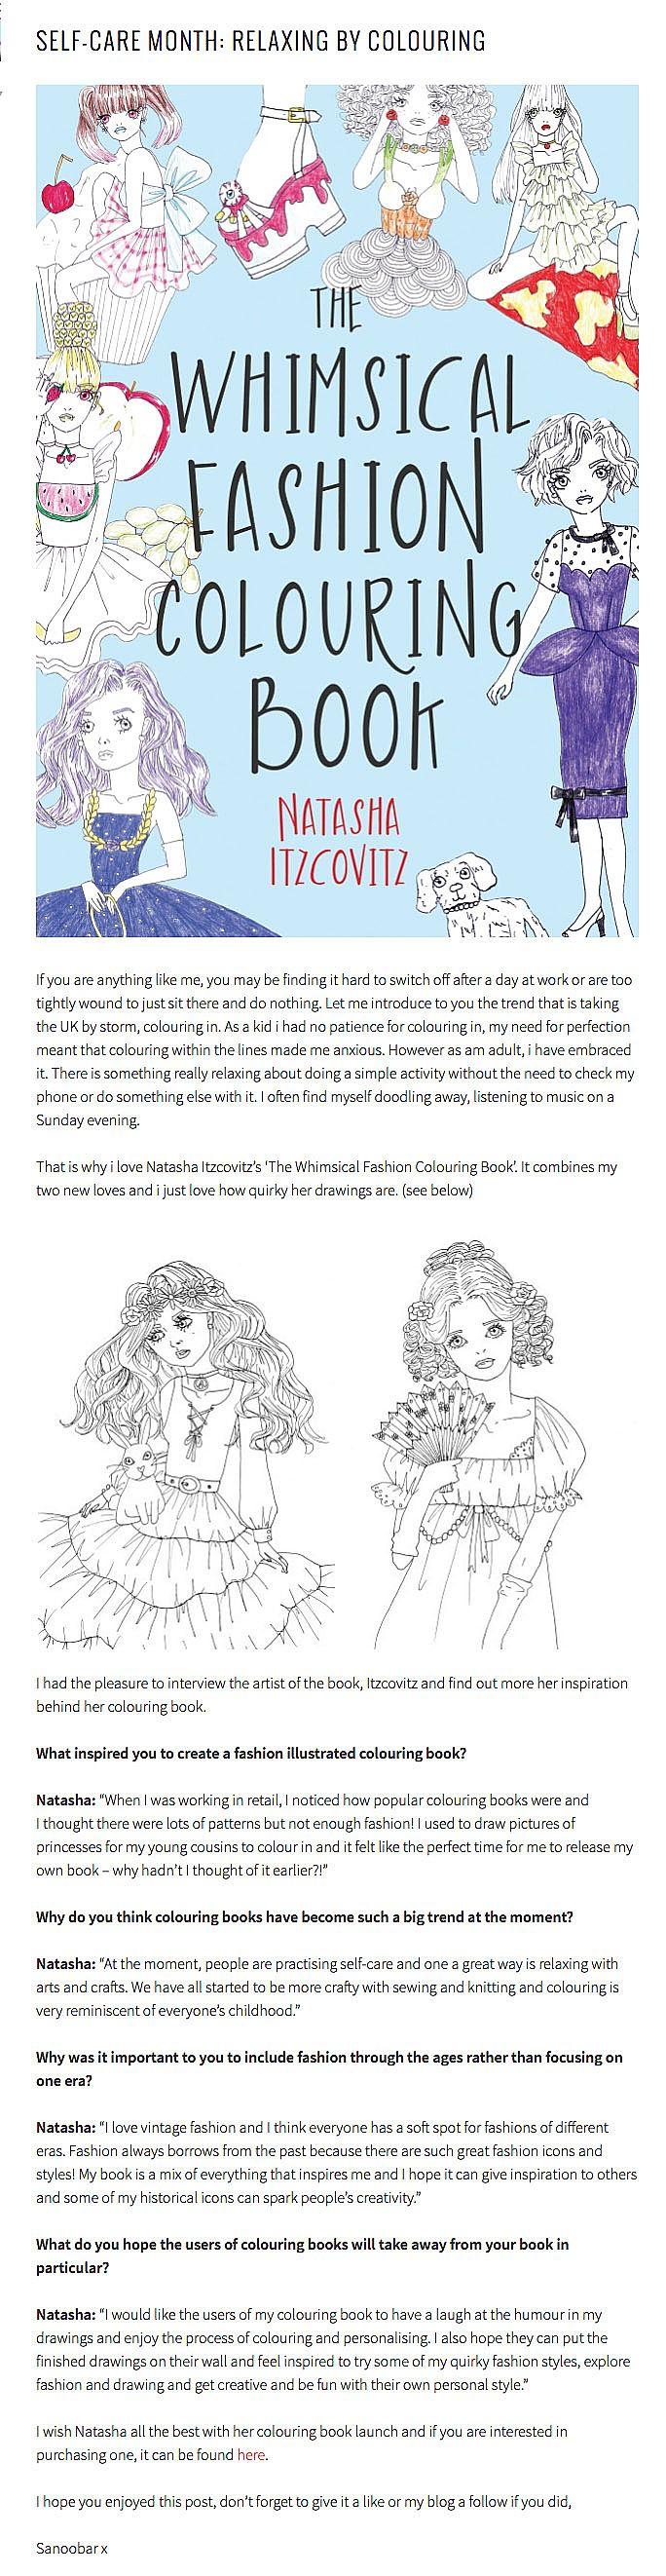 The Whimsical Fashion Colouring Book - Troubador Book Publishing